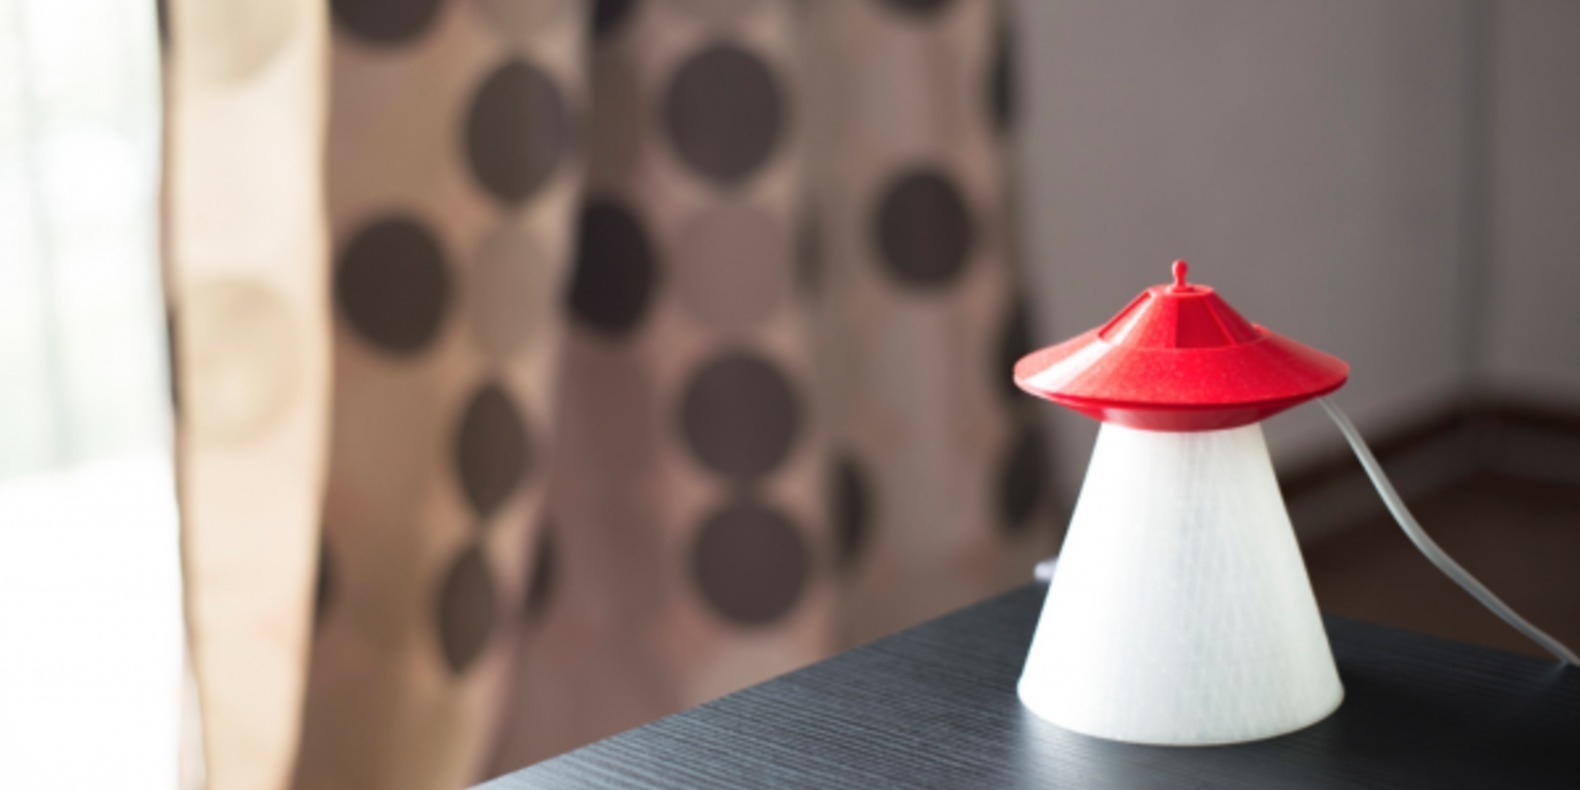 OVNI-lampe-UFO-cults-impression-3D-enfant-1.png